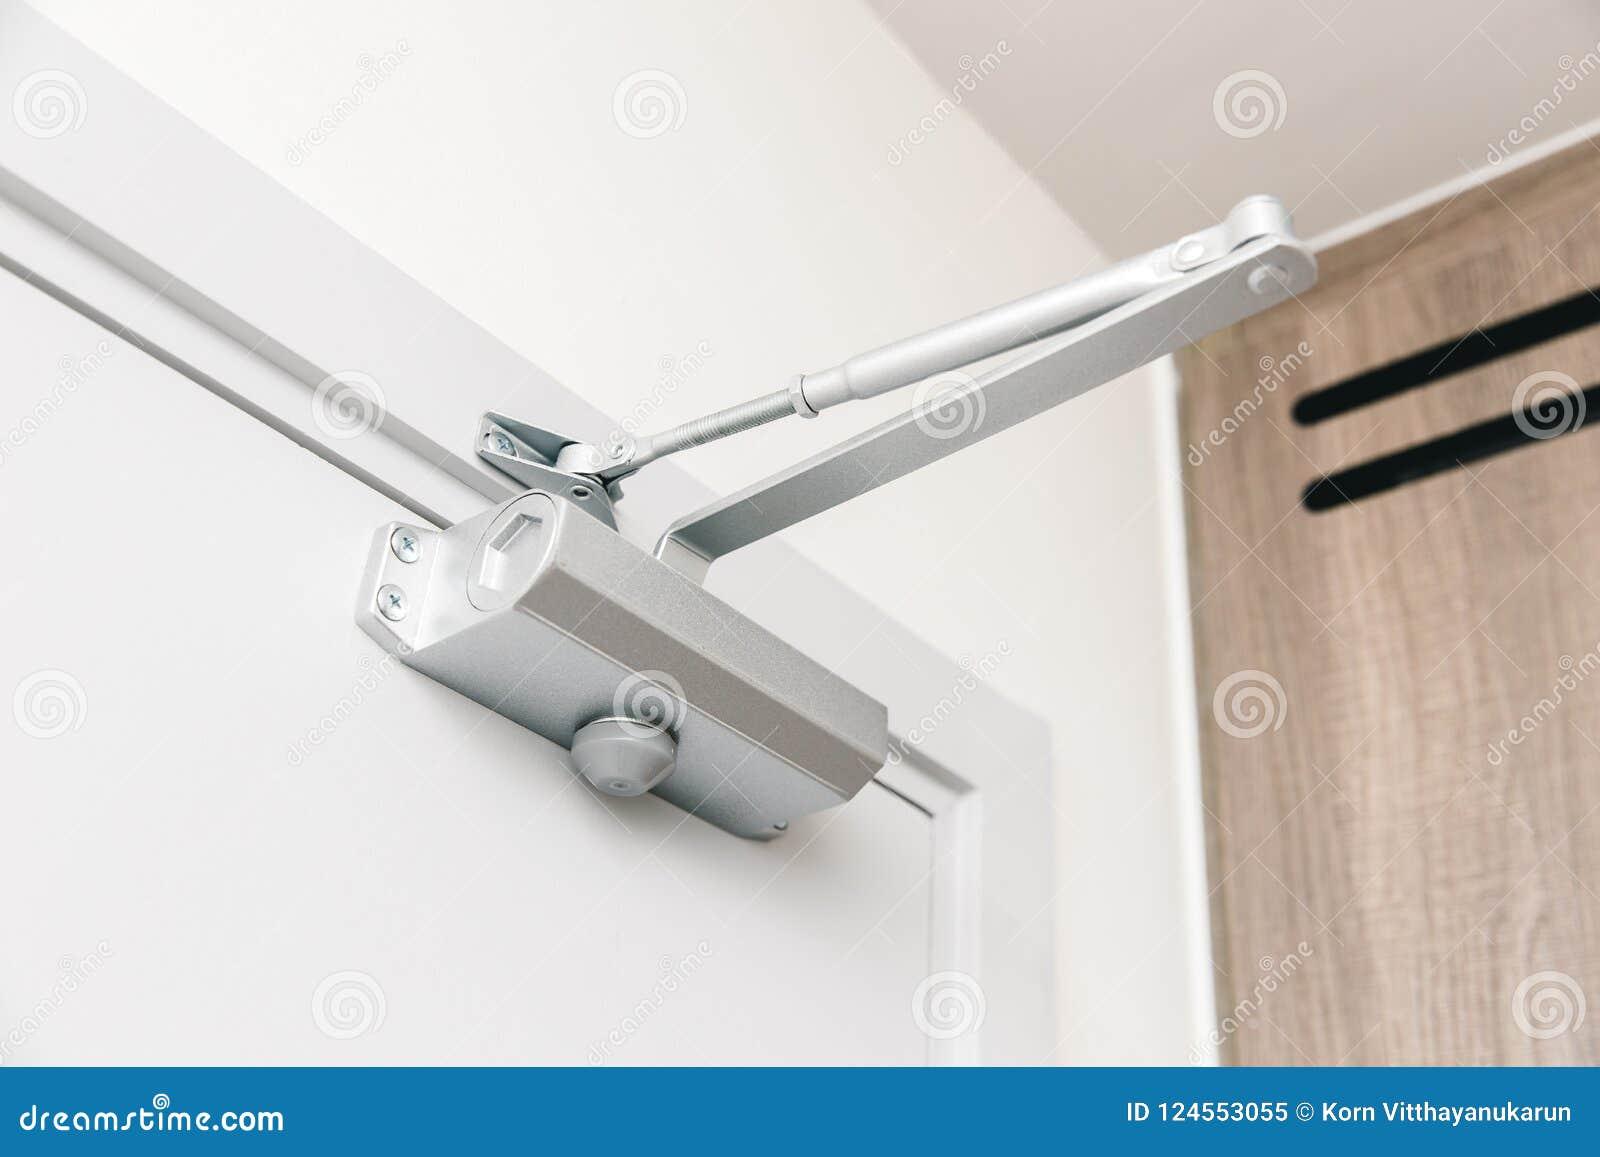 Door Closers Automatic Closing Door Device Stock Image